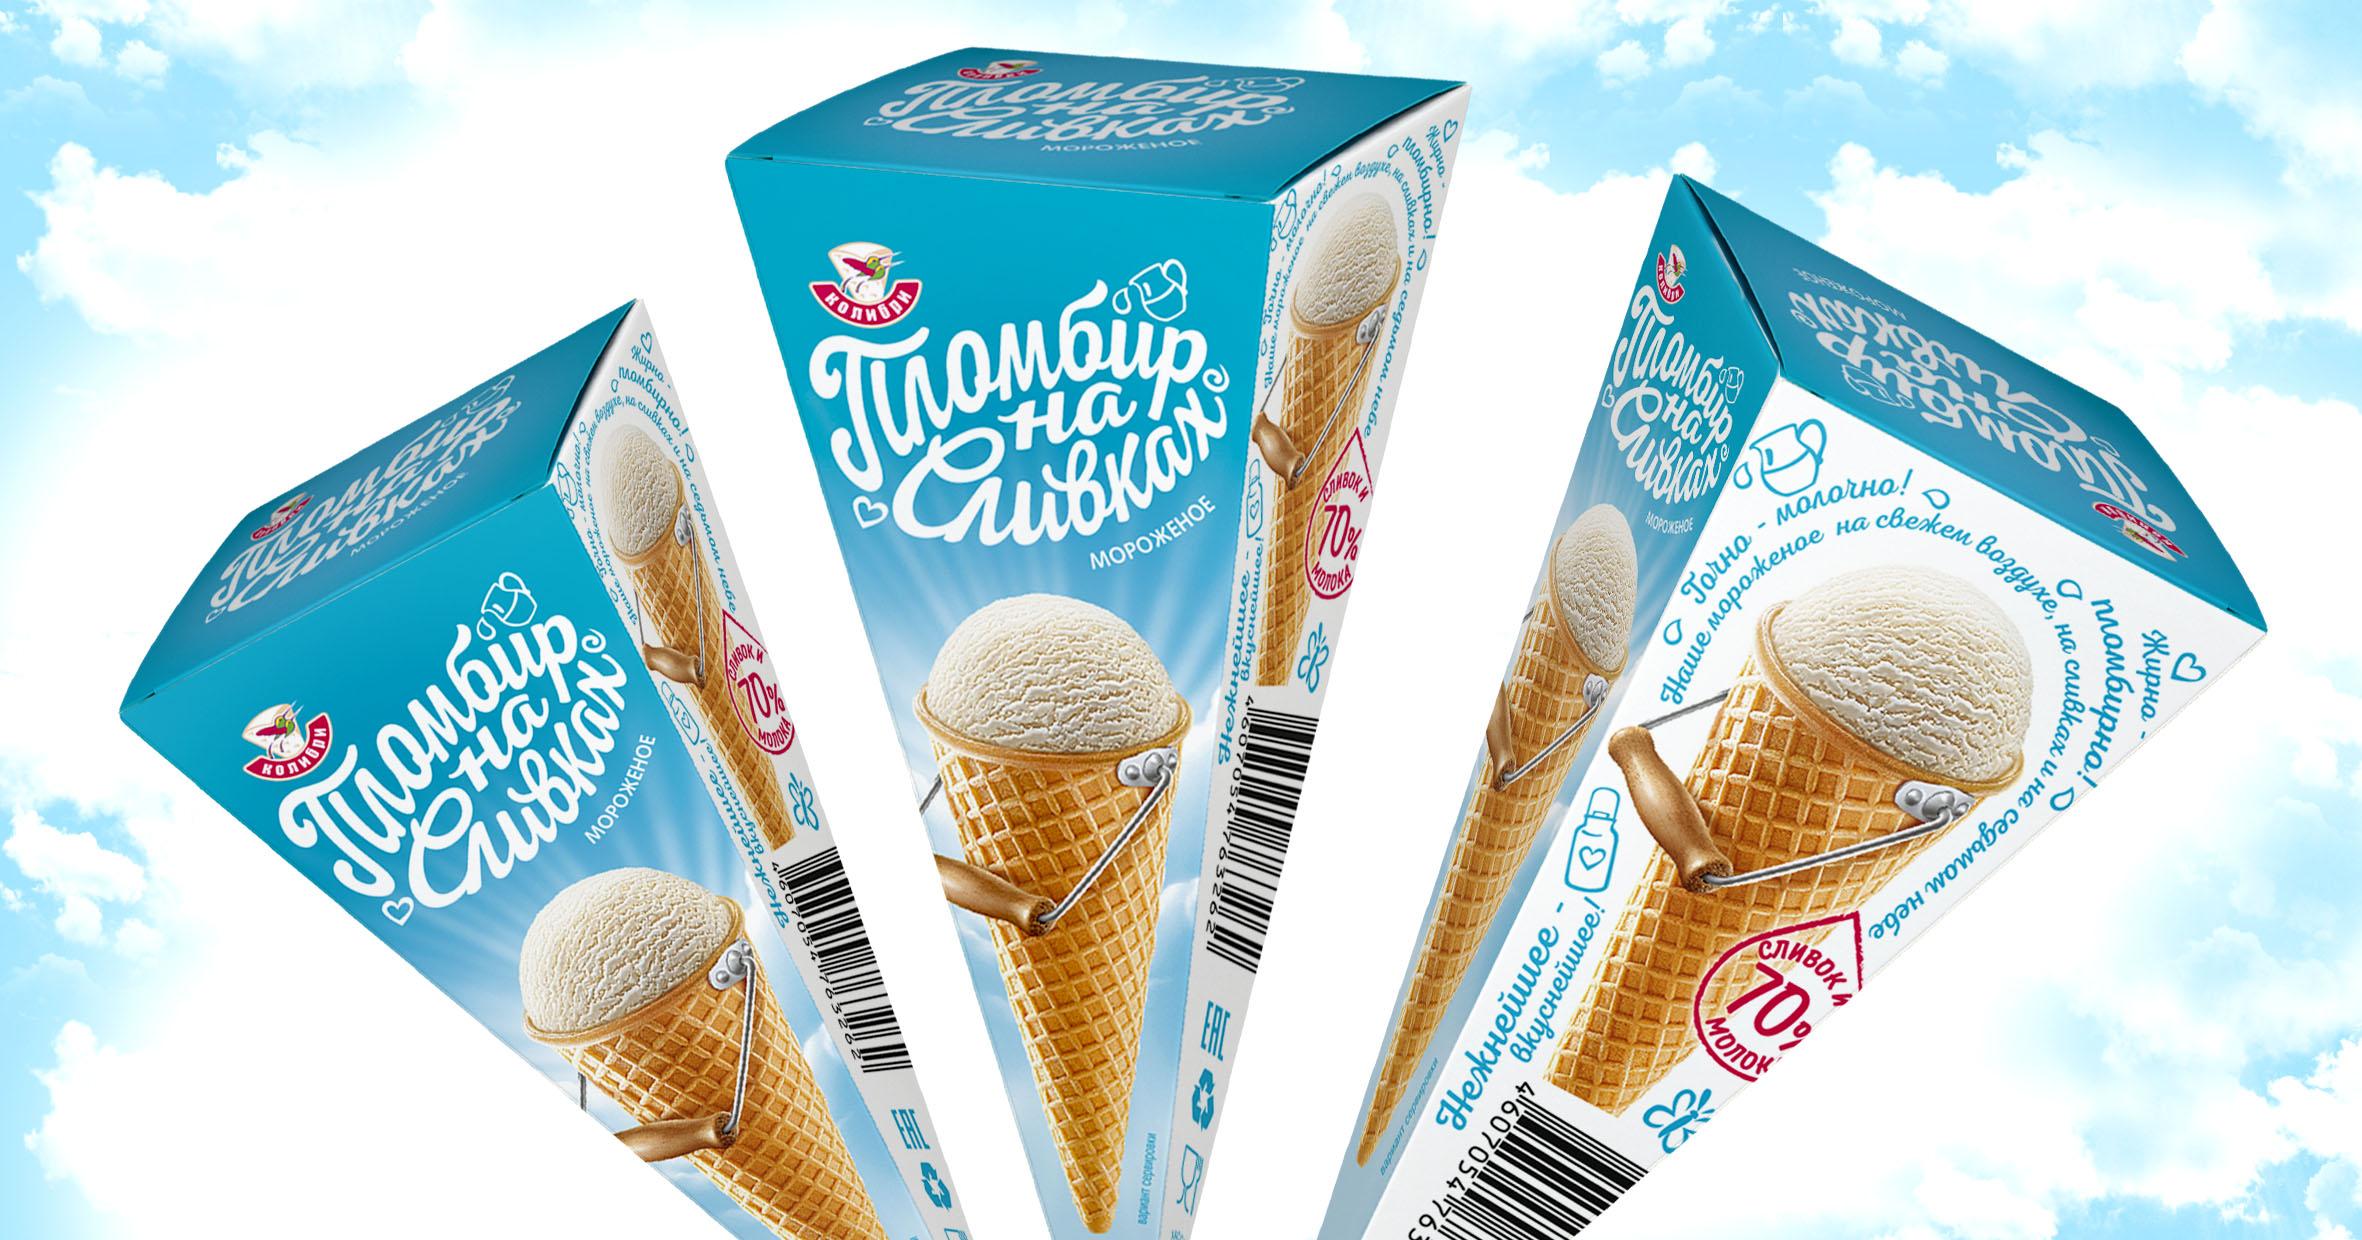 Design of the concept ice cream